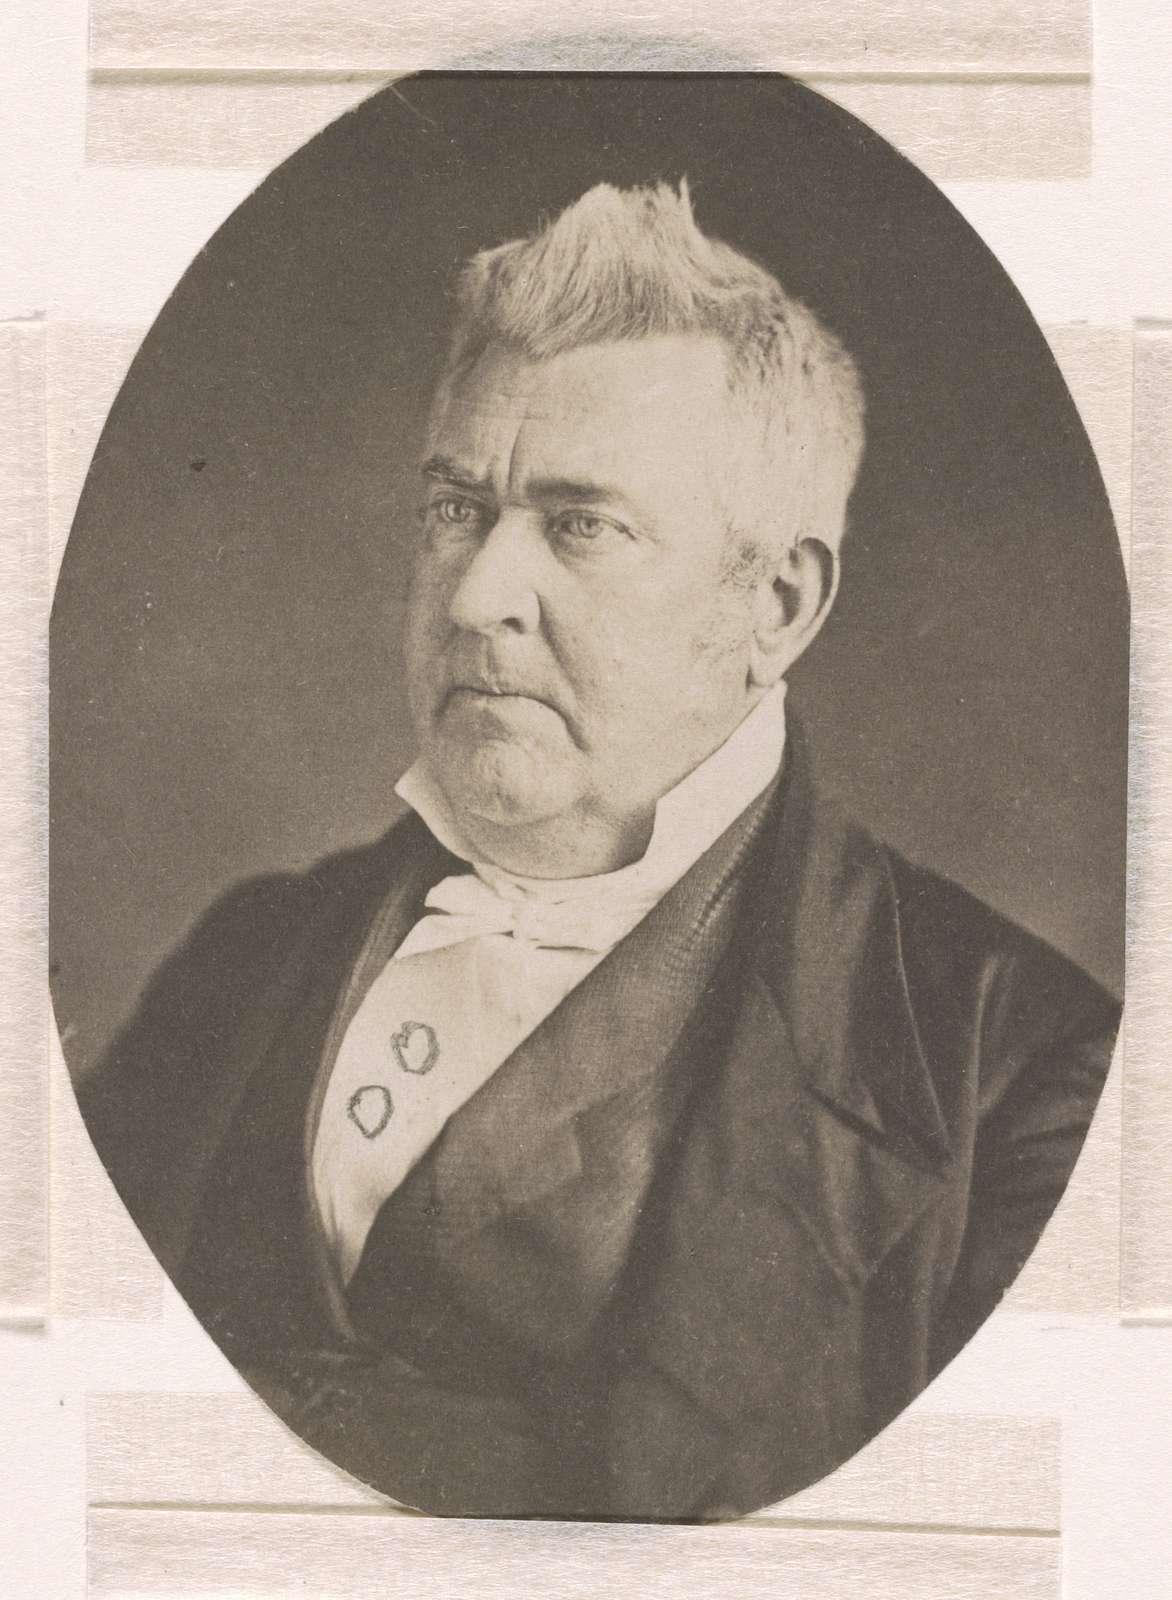 John M. Clayton, head-and-shoulders length studio portrait, facing left